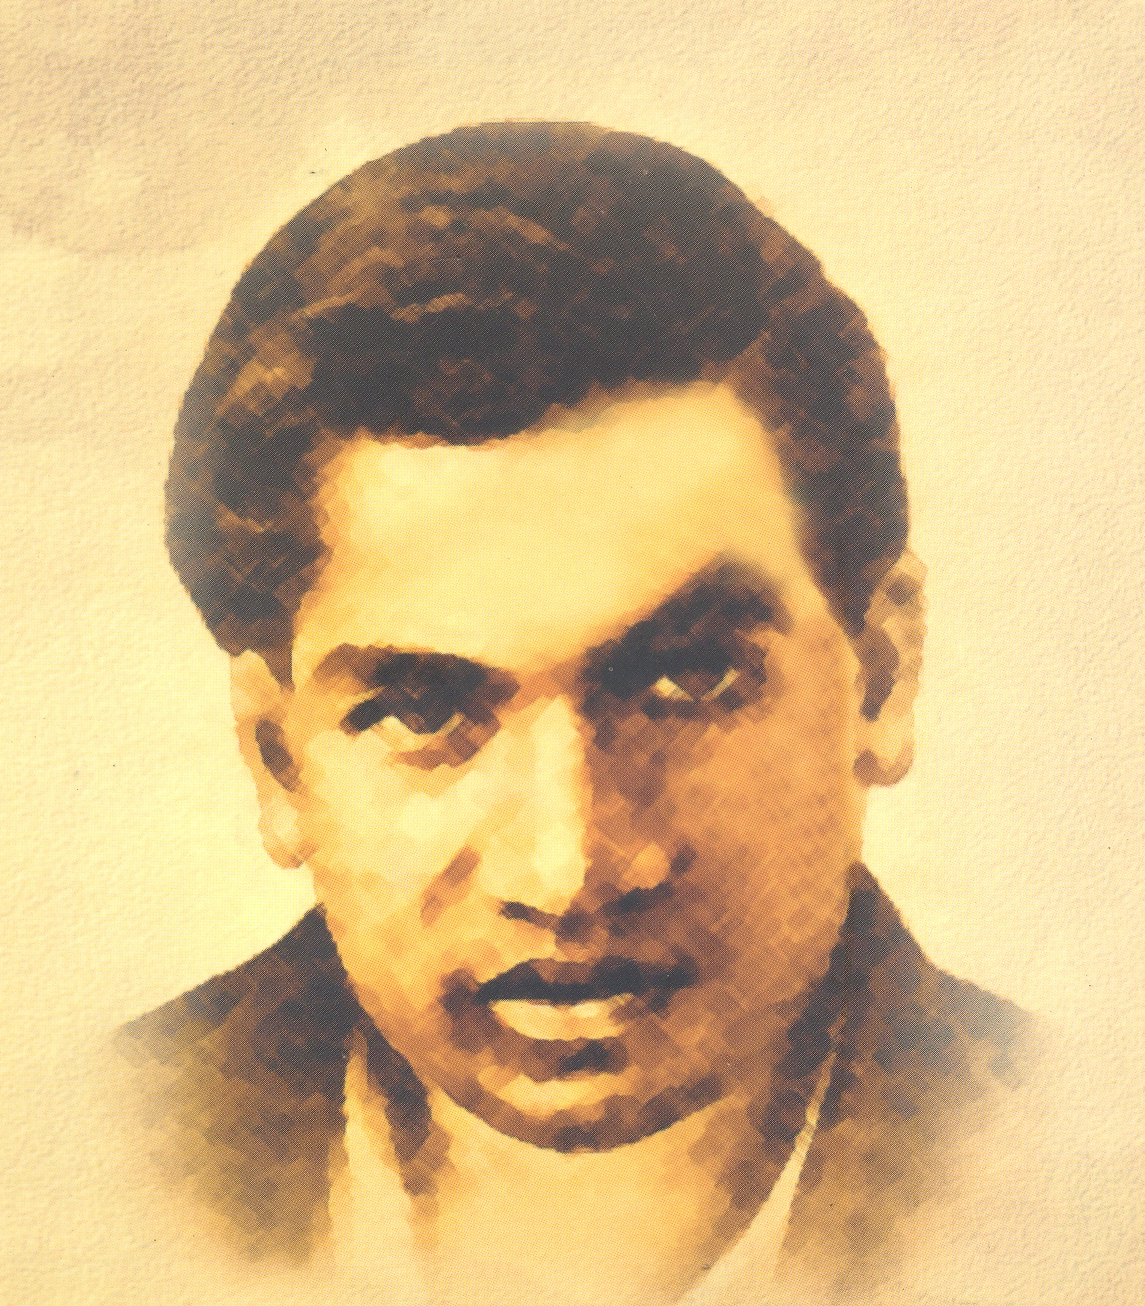 Srinivas Ramanujan December 22, 1887-April 26, 1920